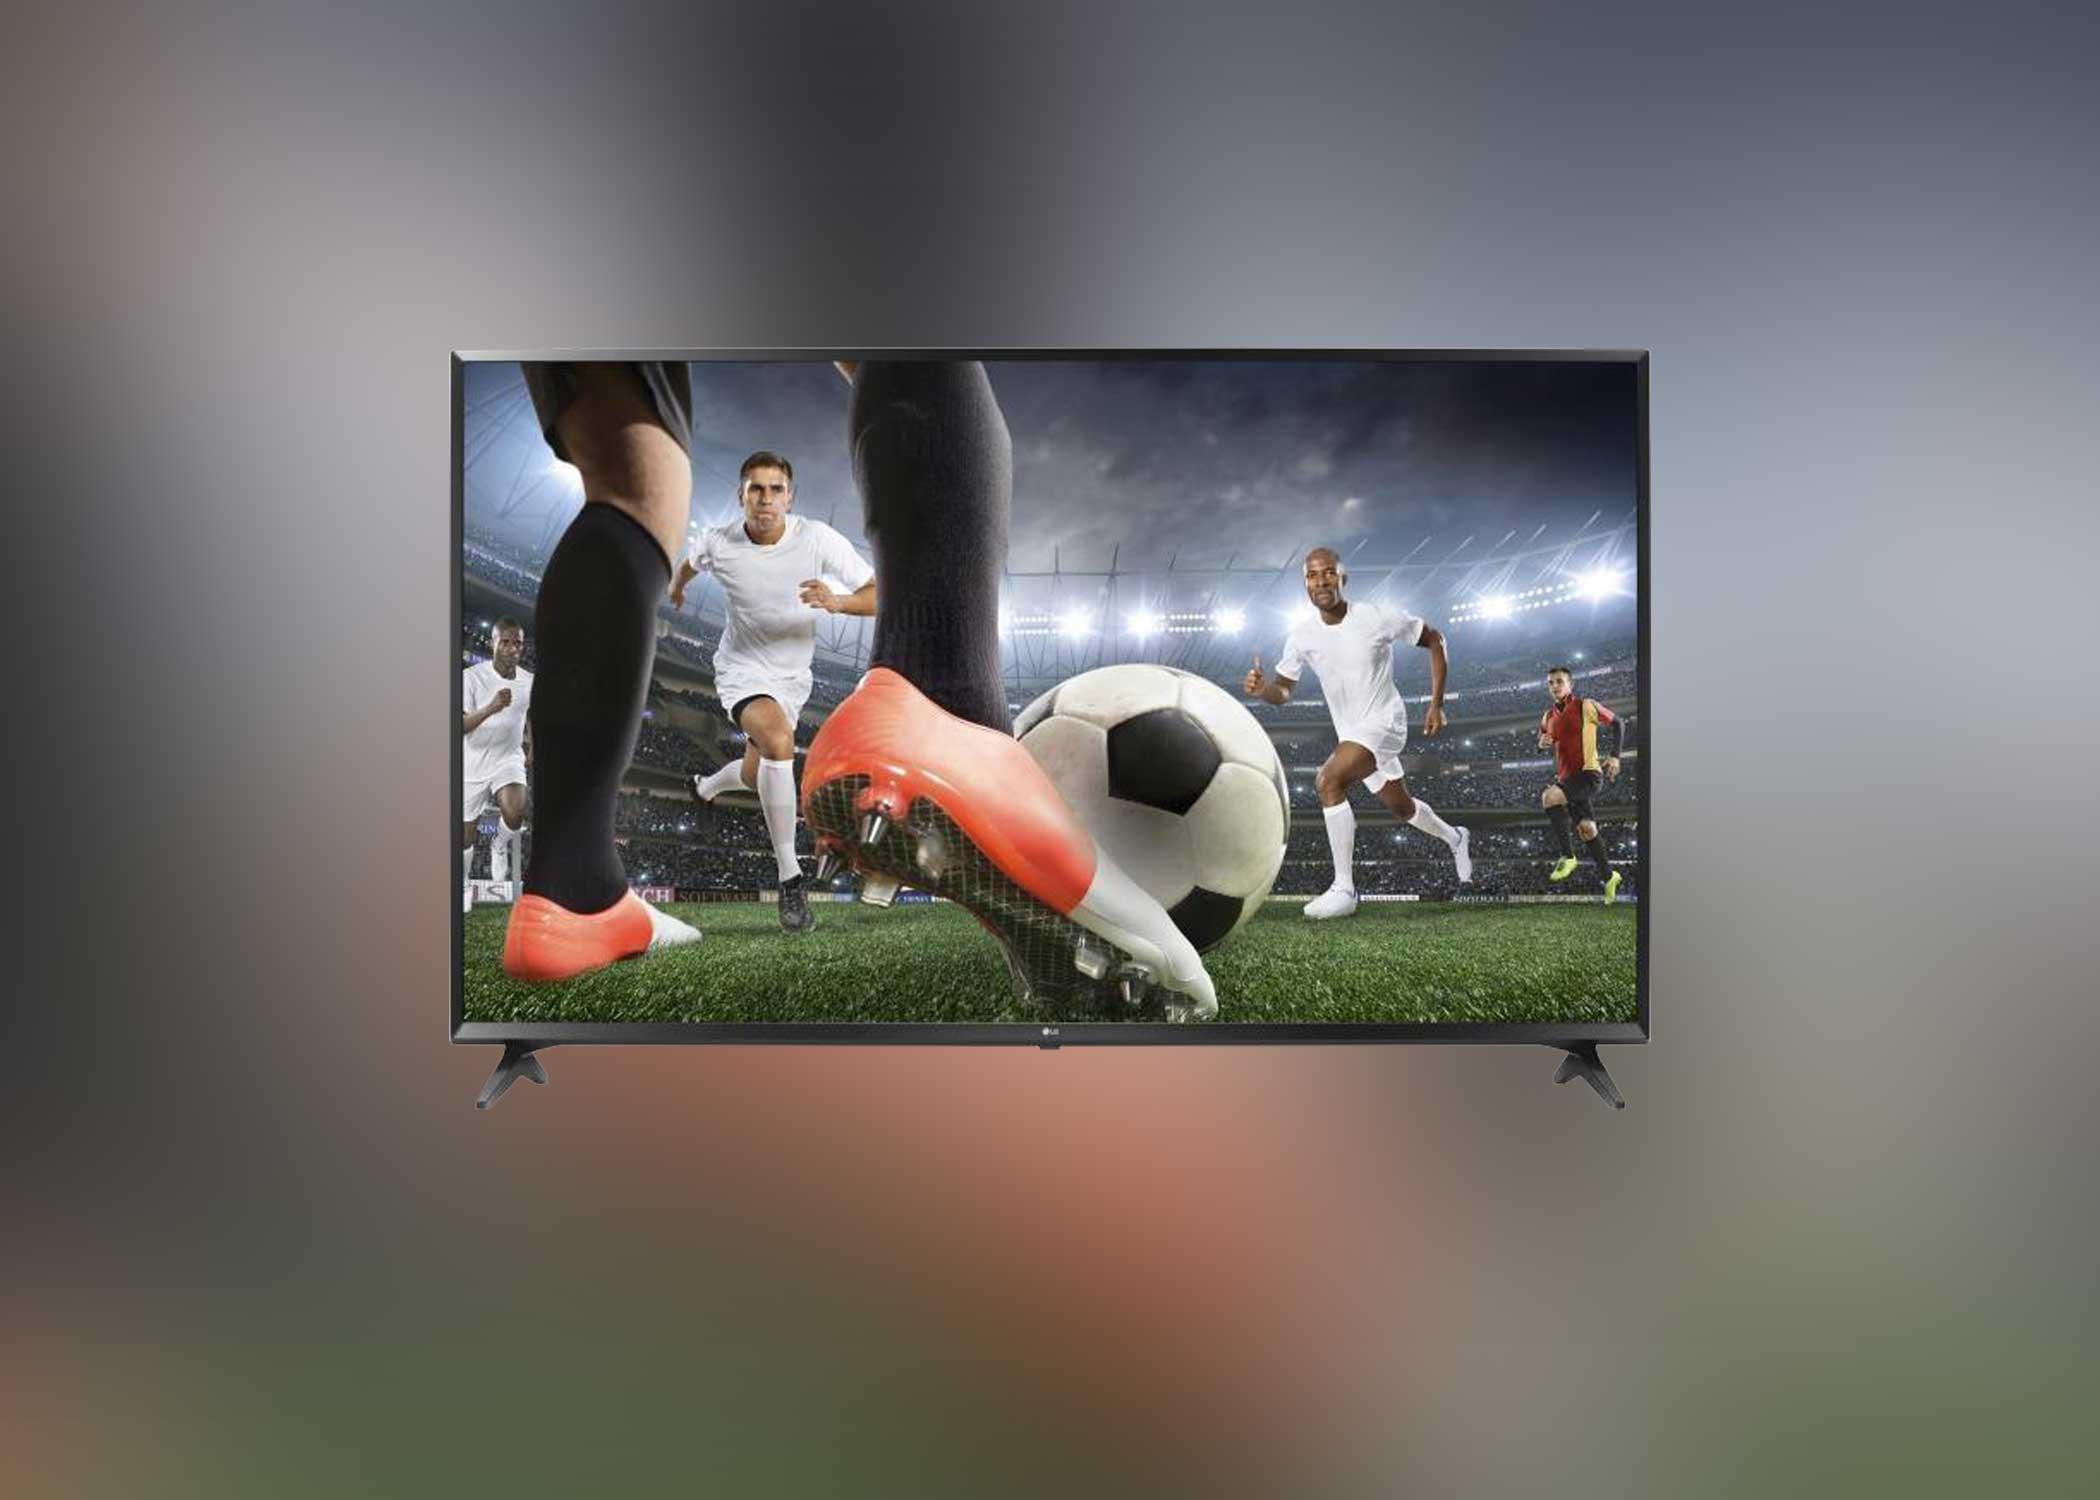 🔥 Bon plan : la TV LG (55UK6100) 4K UHD à 499 euros chez Cdiscount